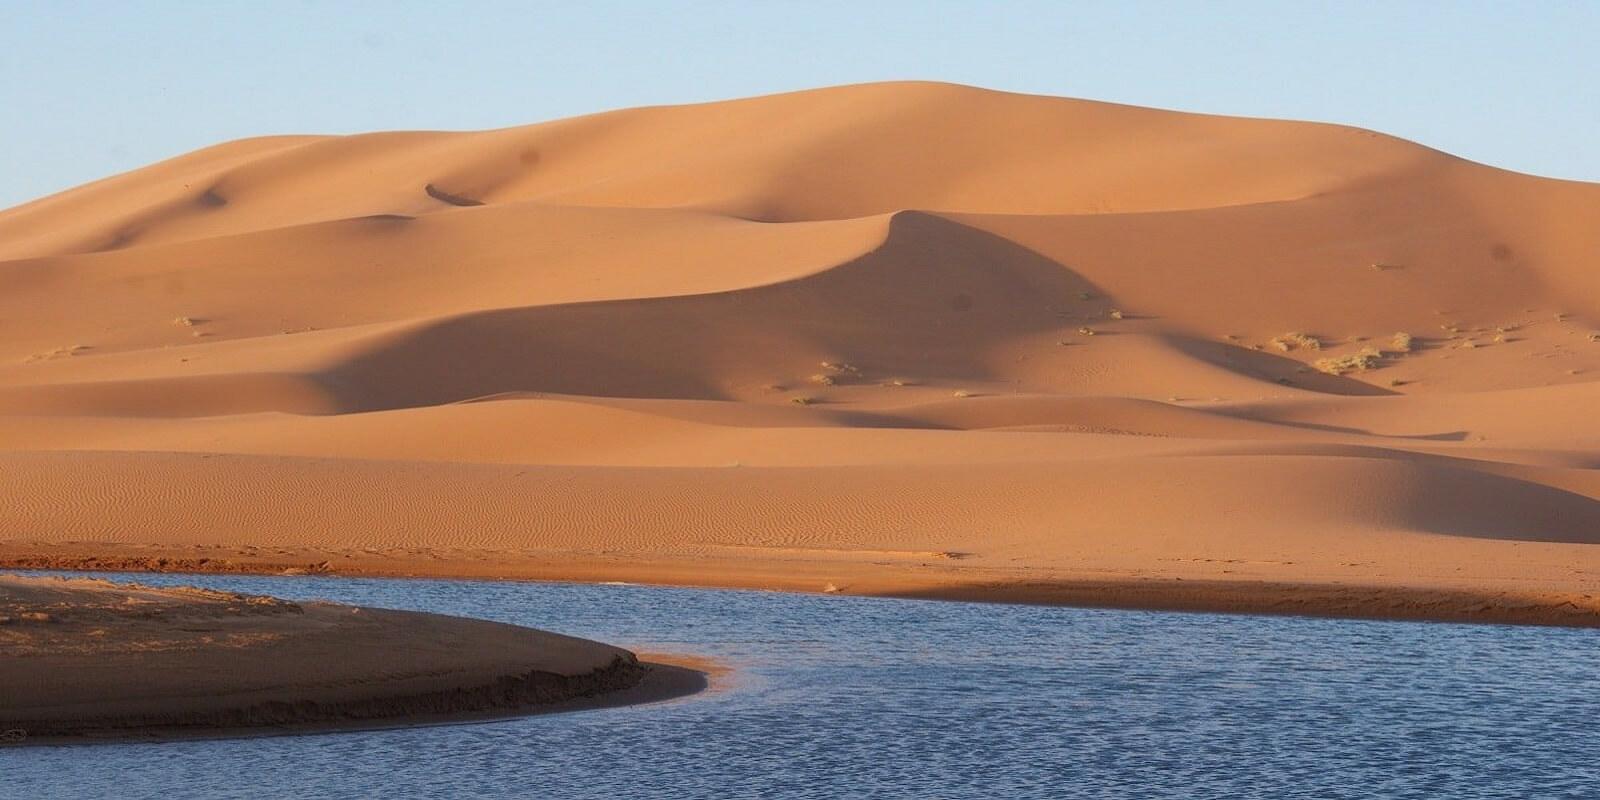 sand dunes and lake in sahara desert